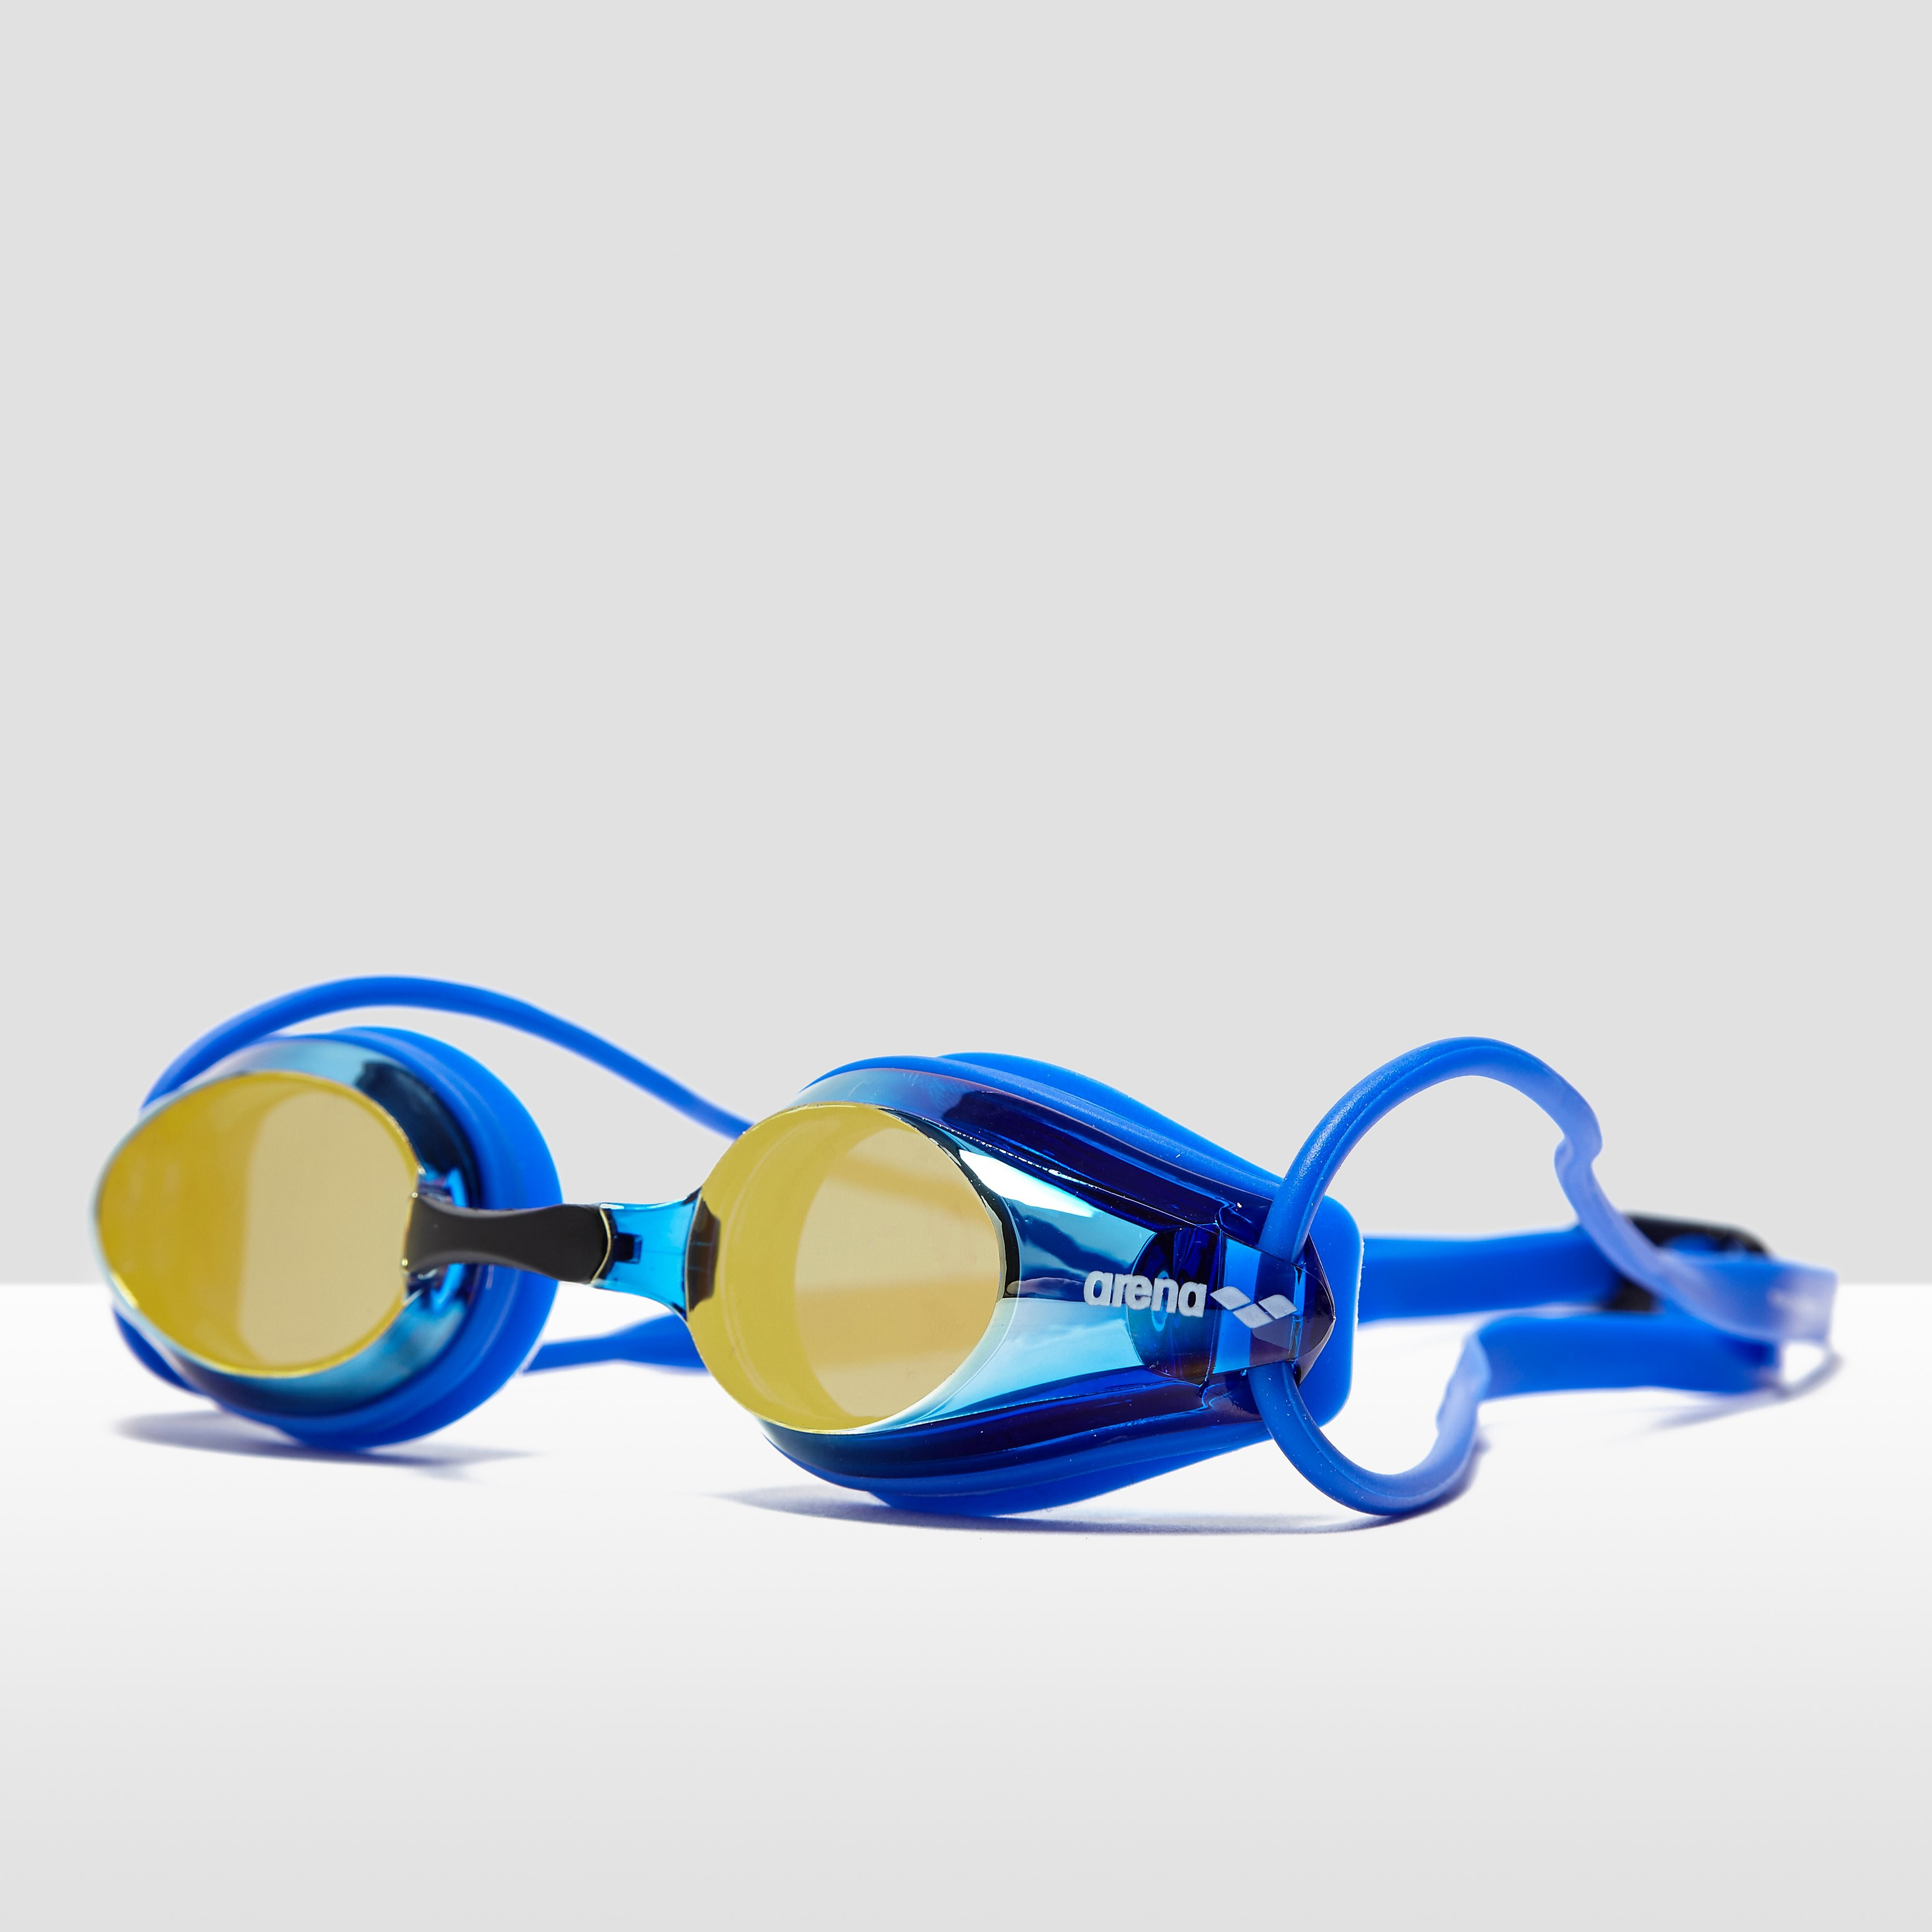 Arena Tracks Junior Mirror Goggles